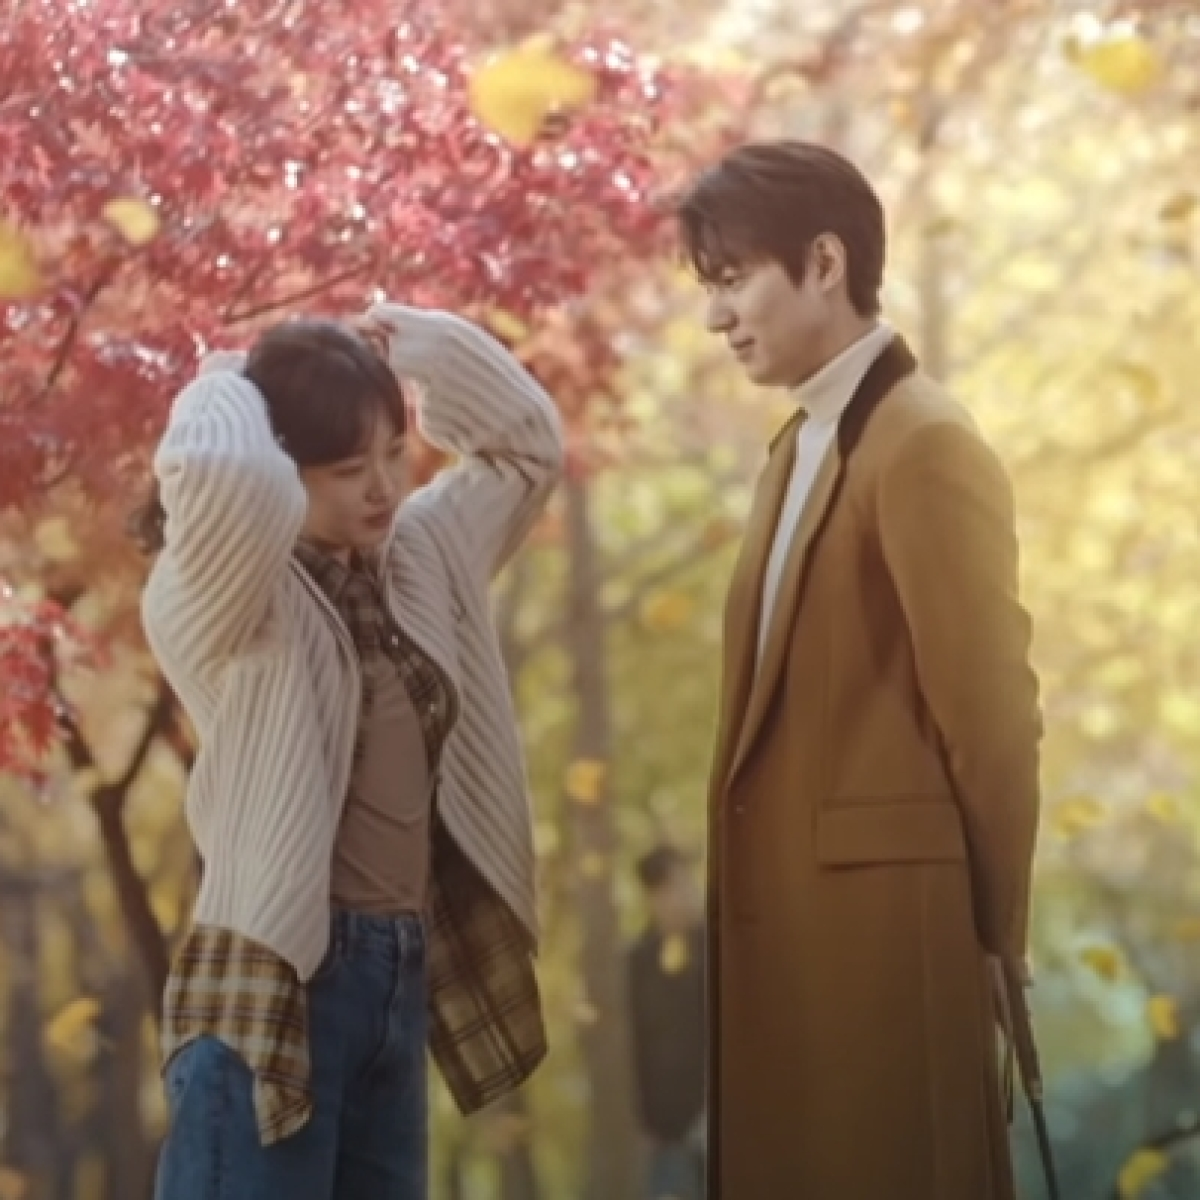 Netflix's latest Korean drama 'The King: Eternal Monarch' is a must-watch amid quarantine